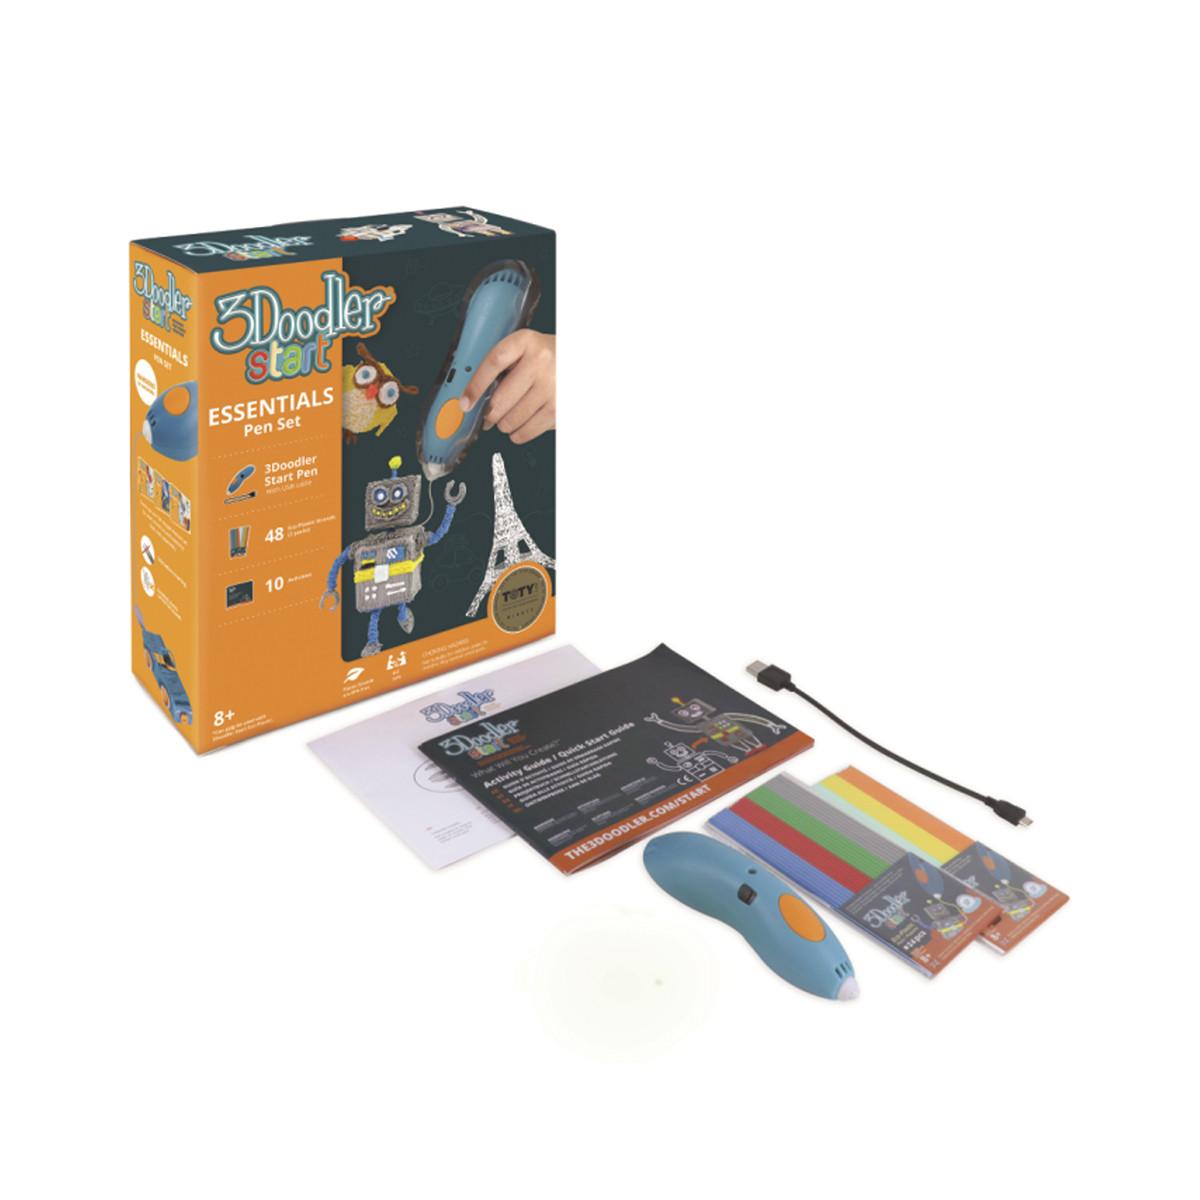 3D-ручка 3Doodler Start Креатив 48 стержней (3DS-ESST-MULTI-R-17)